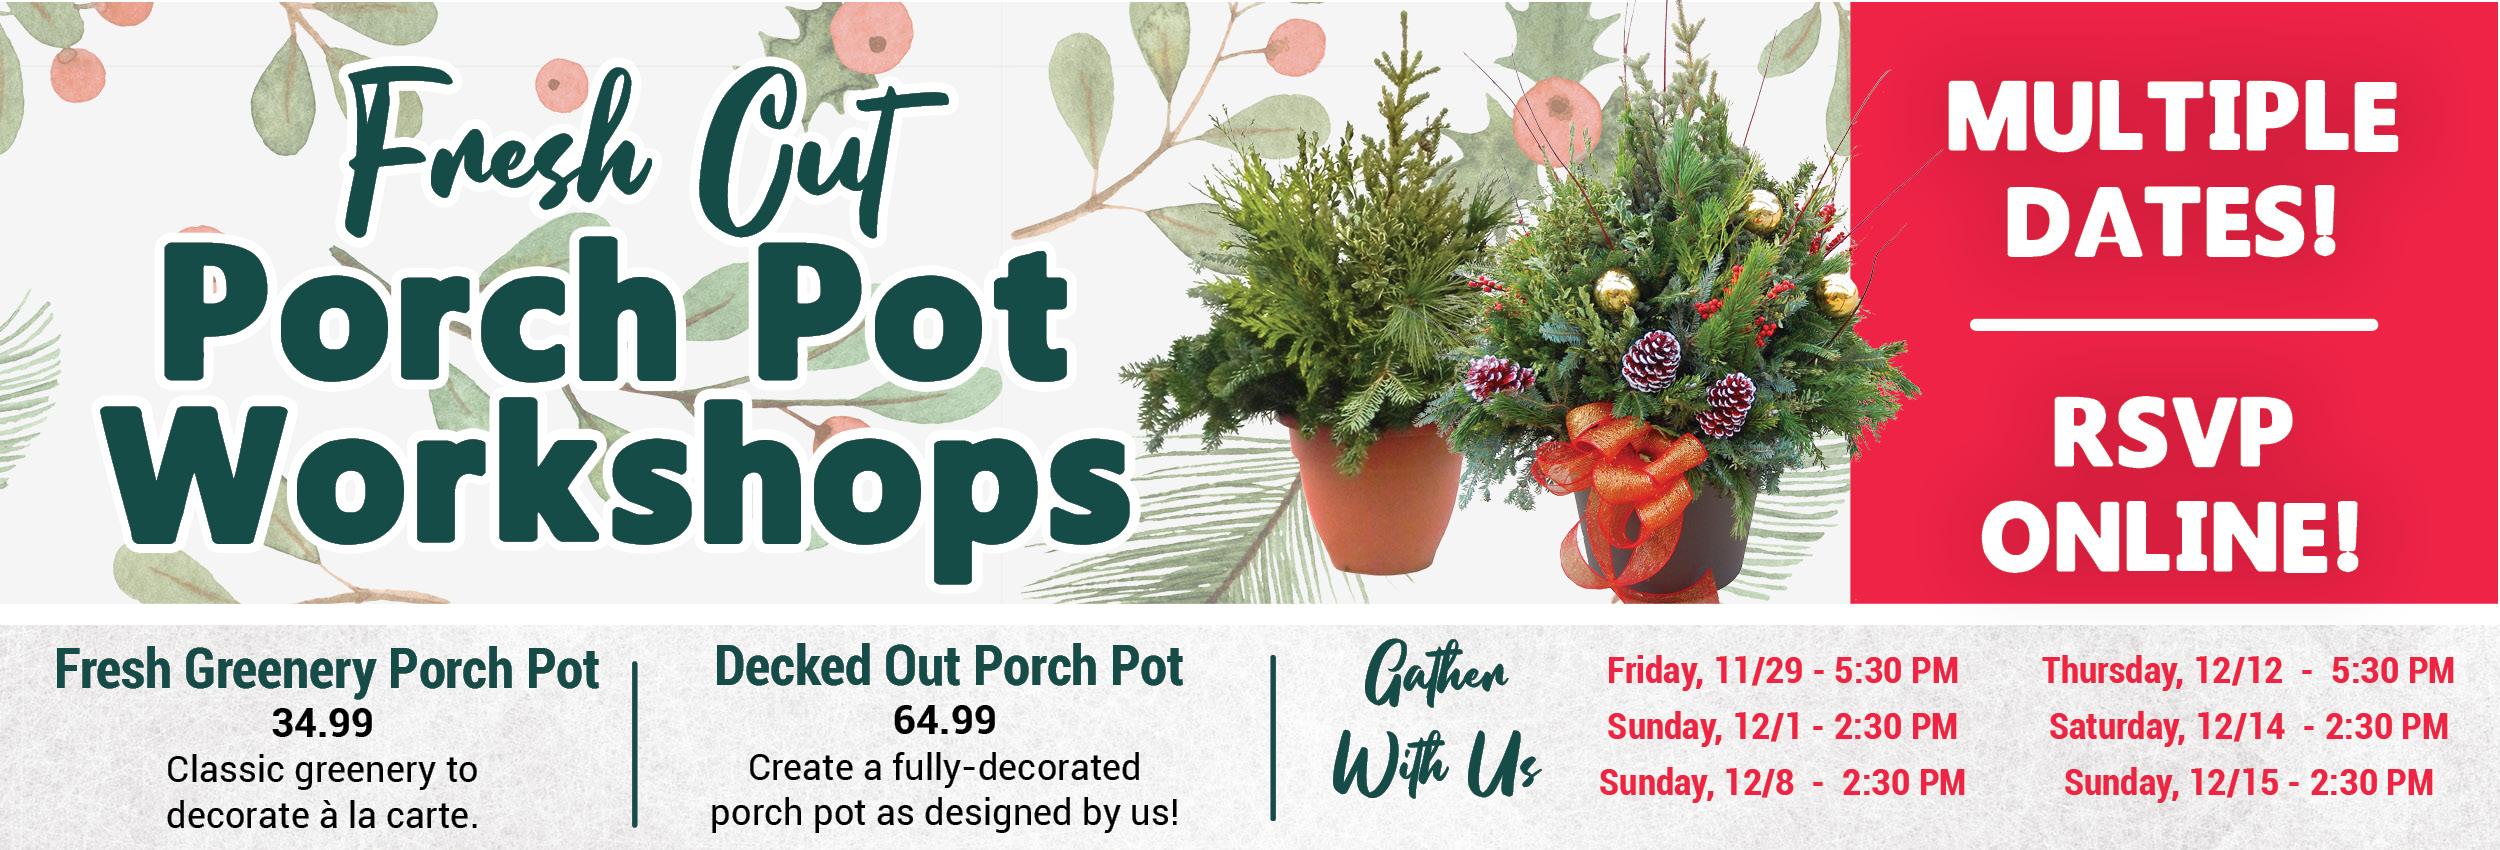 Porch Pot Workshops 2019